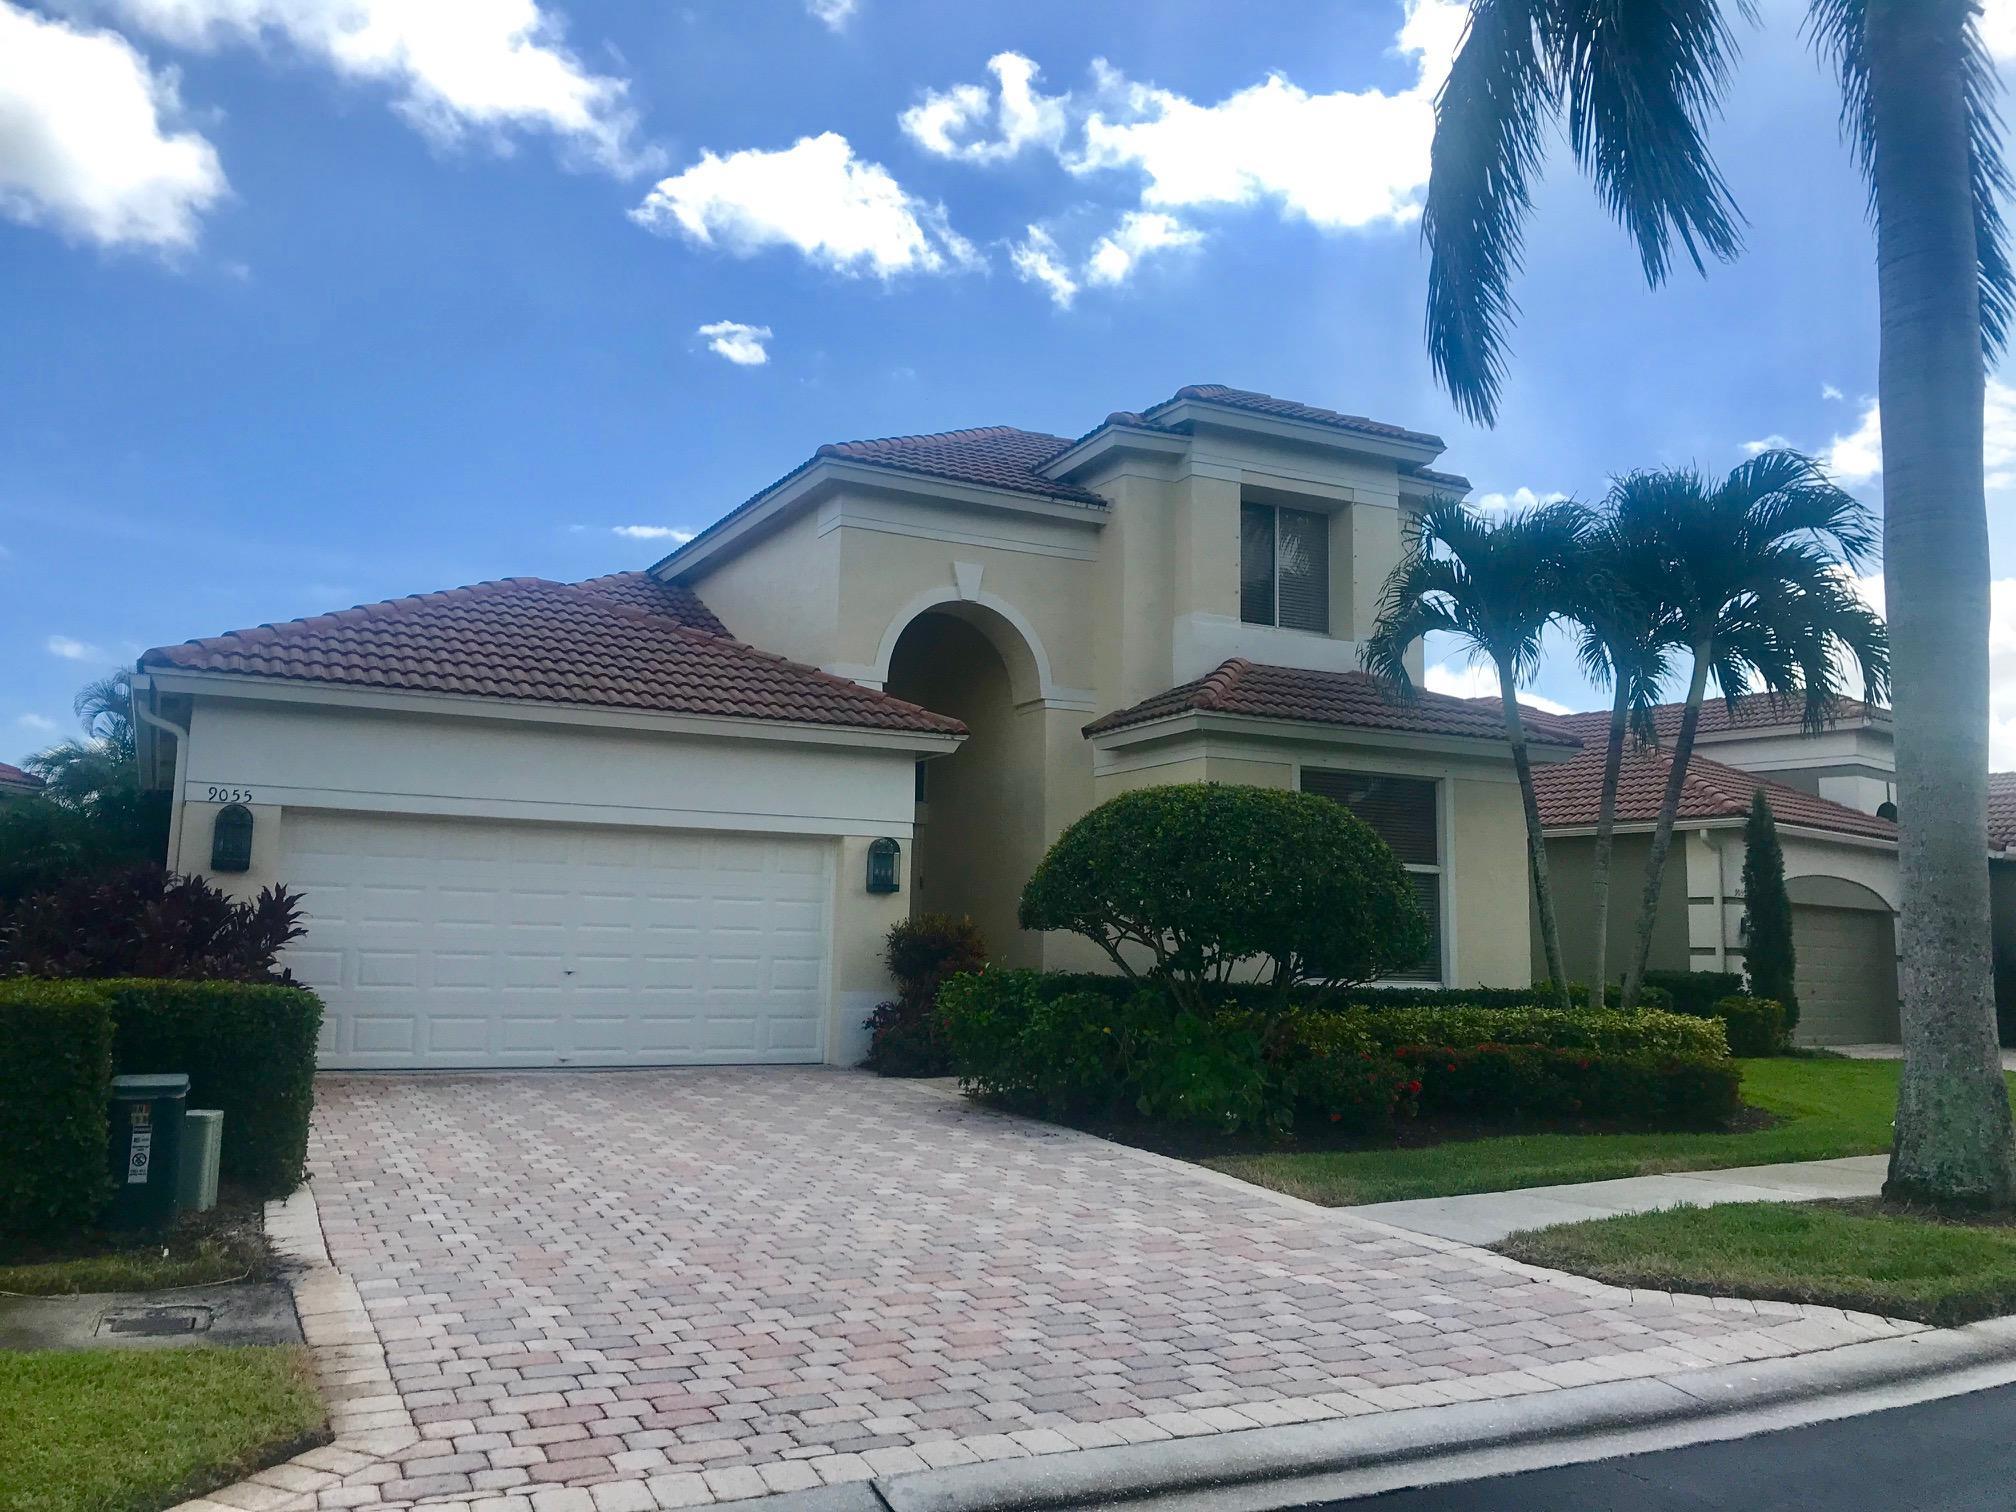 9055 Sand Pine Lane, West Palm Beach, Florida 33412, 3 Bedrooms Bedrooms, ,3 BathroomsBathrooms,Rental,For Rent,Sand Pine,RX-10562813